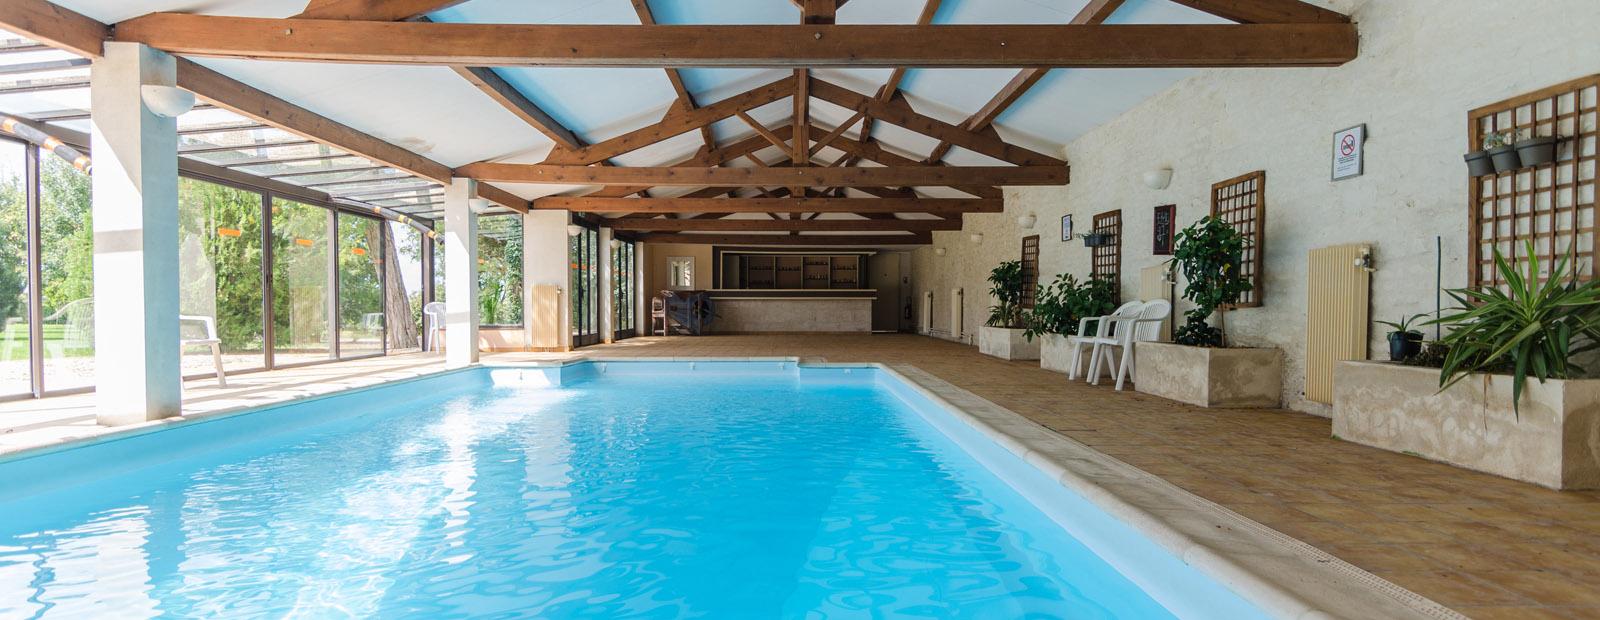 Piscine de niort trendy vente piscine with vente de for Piscine desjoyaux niort